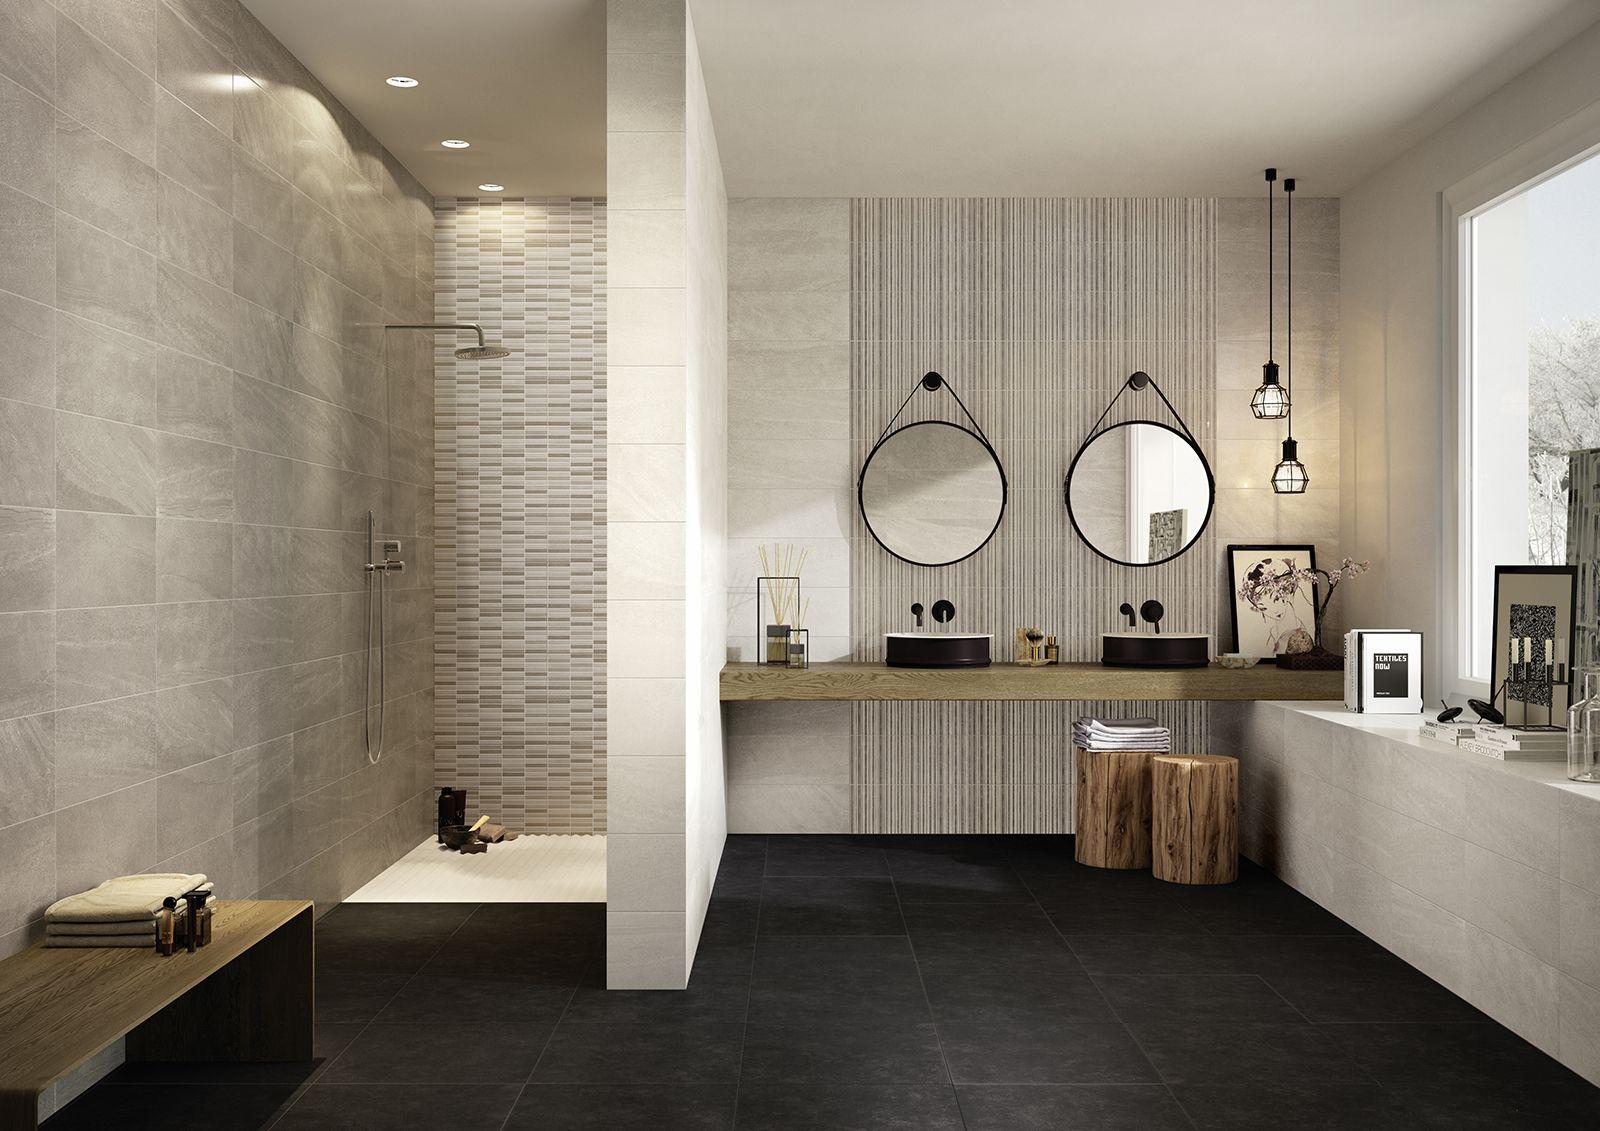 Marazzi Interiors Ice 20x50 Cm Mh9h Runde Badezimmerspiegel Badezimmerideen Badezimmer